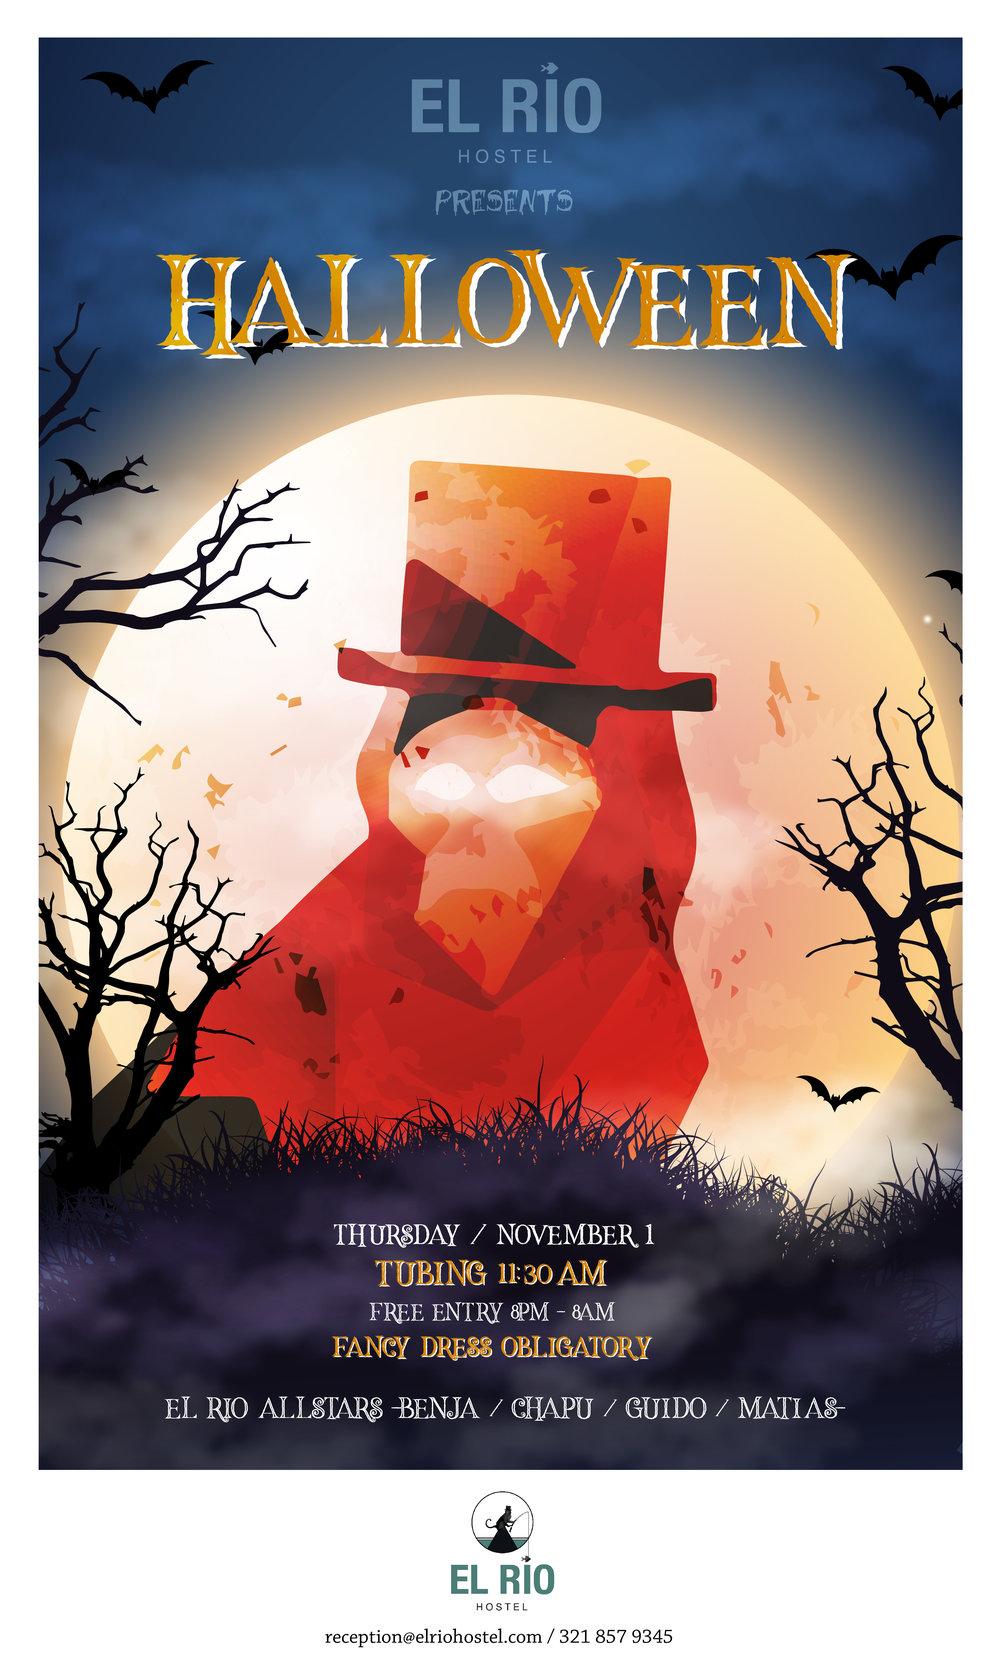 ElRio_Halloween-Print-01.jpg